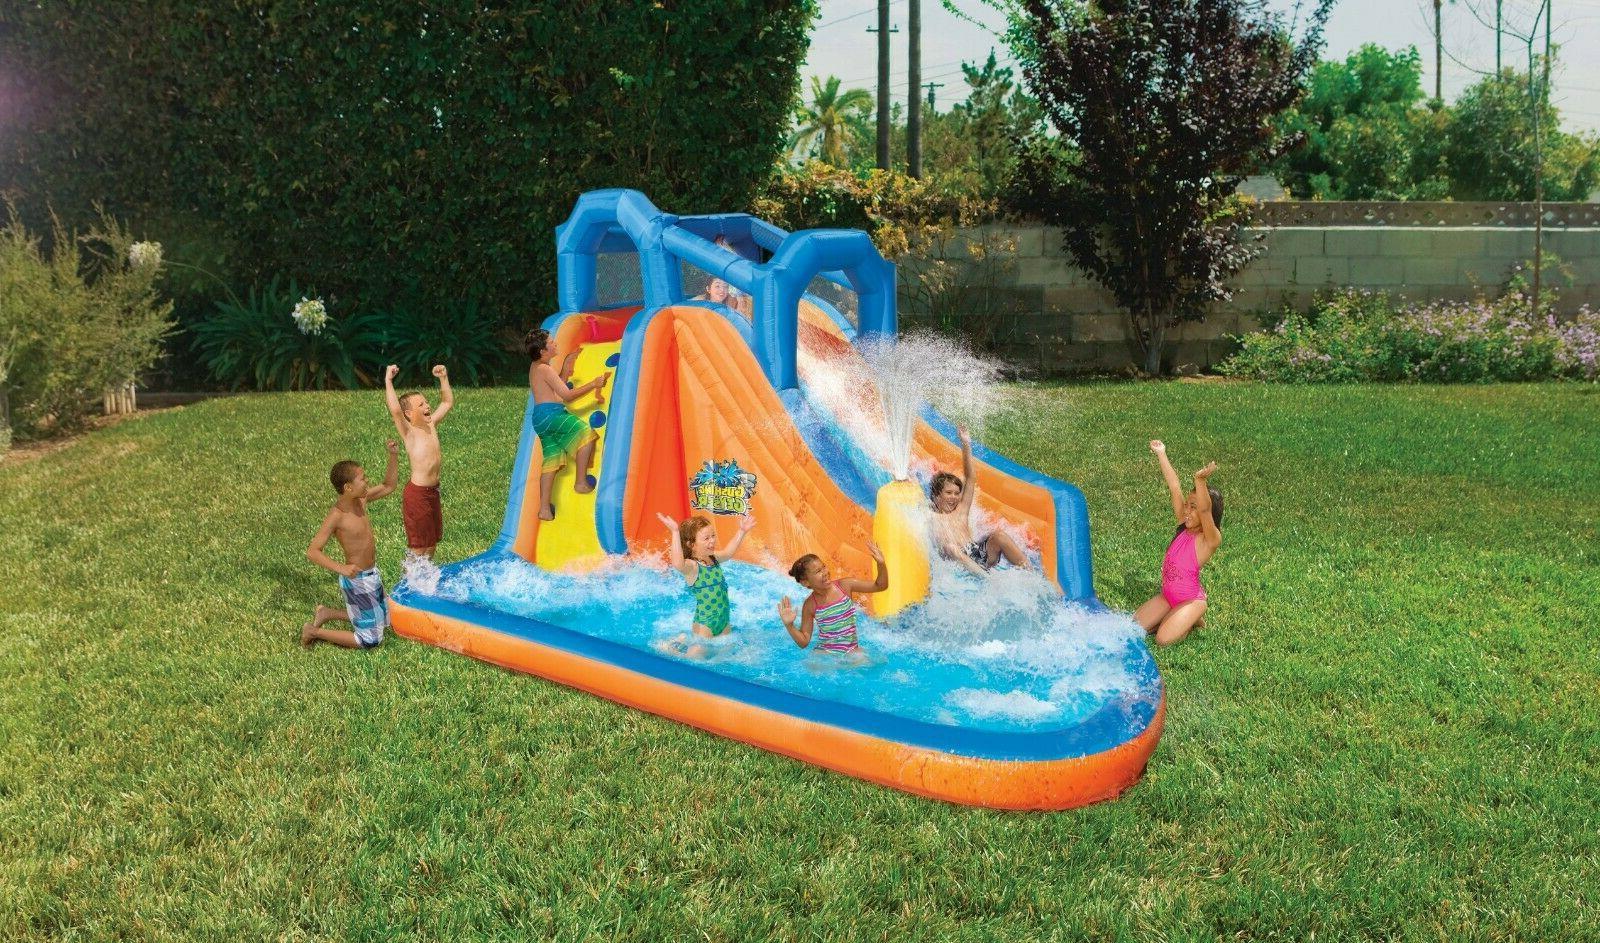 💦☀️Banzai WATER PARK Pool Slide - Fast